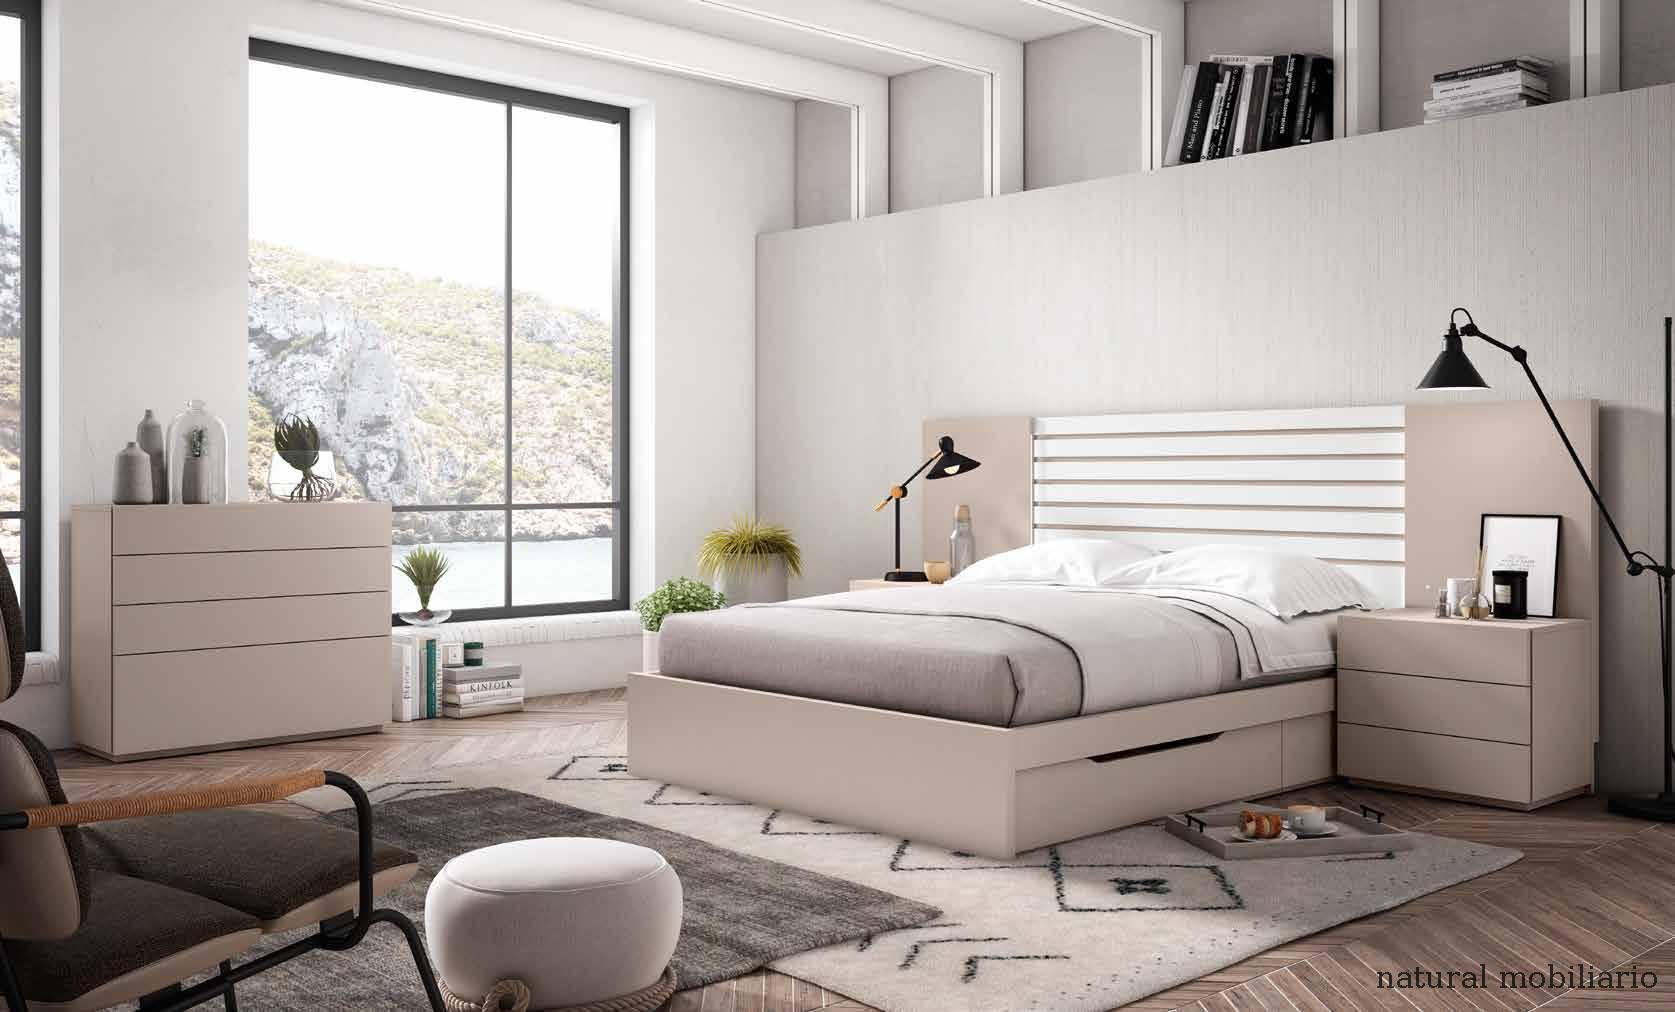 Muebles Modernos chapa sintética/lacados Boho dormitorio moderno